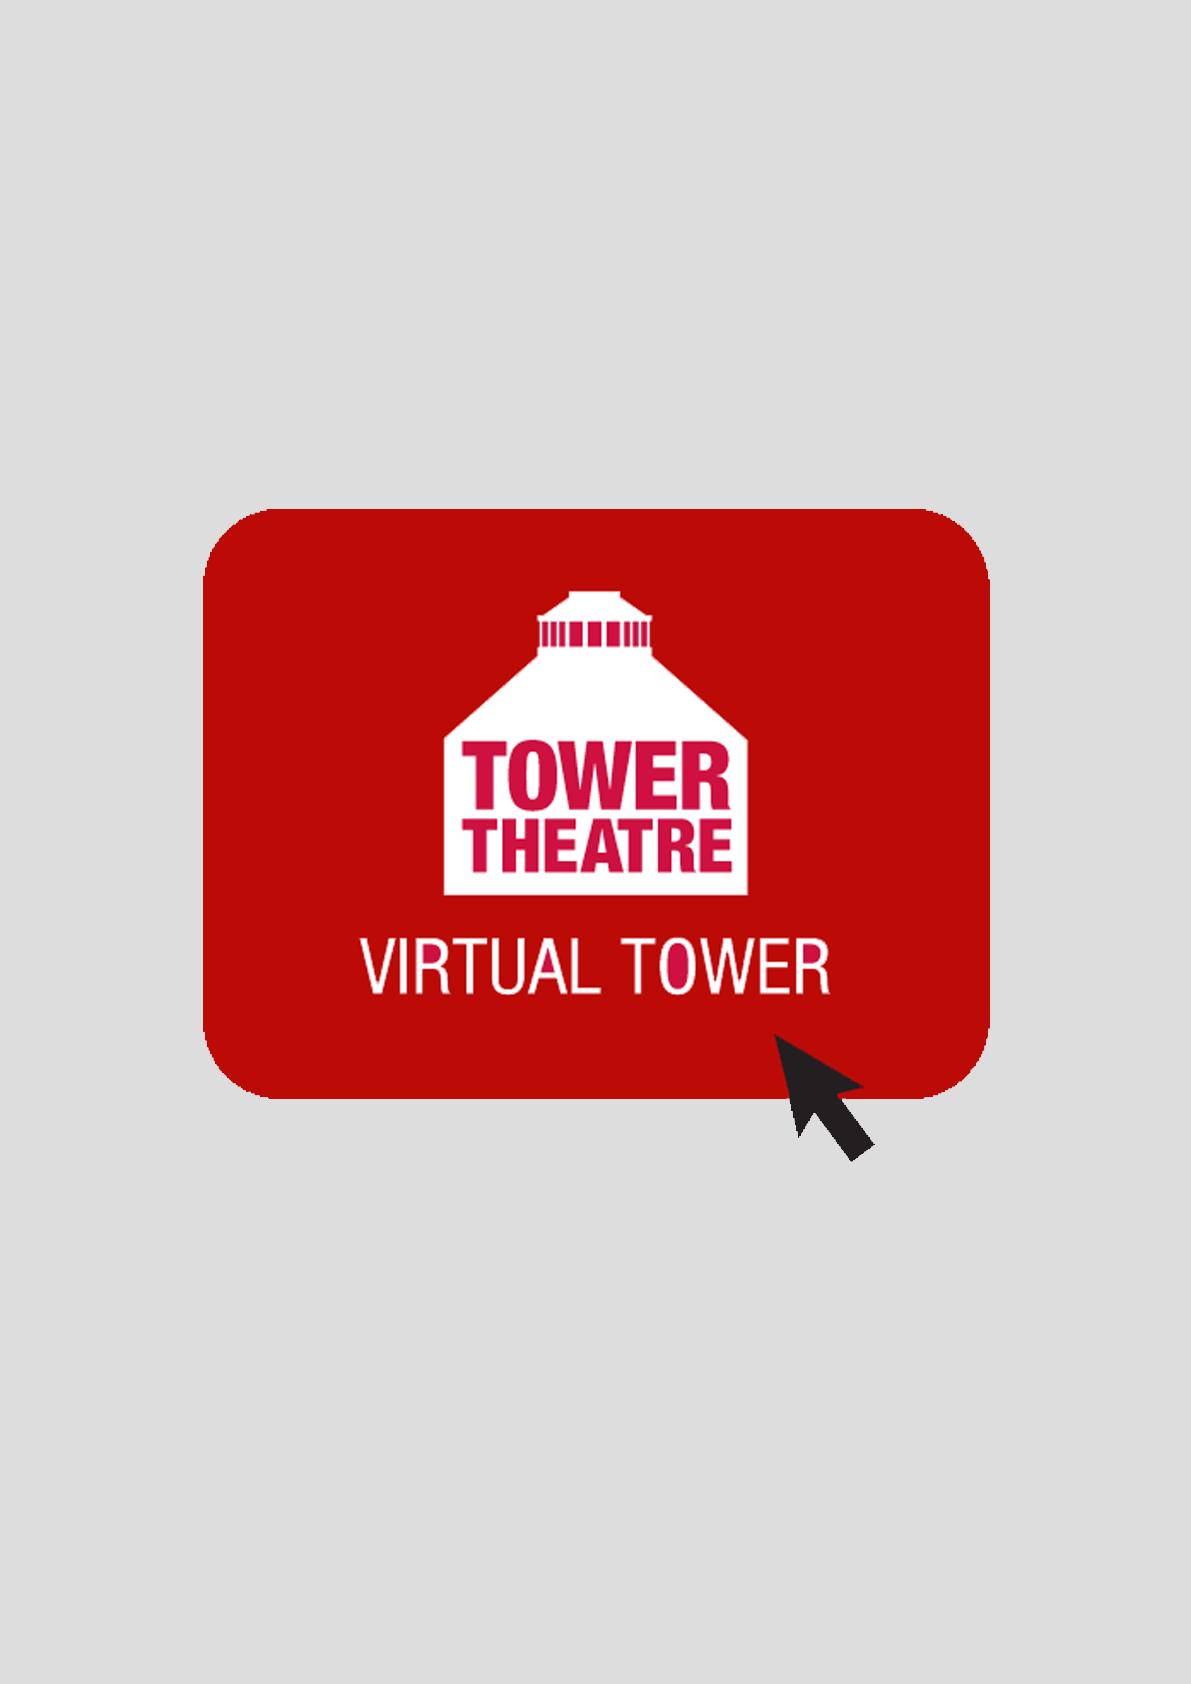 Virtual Tower